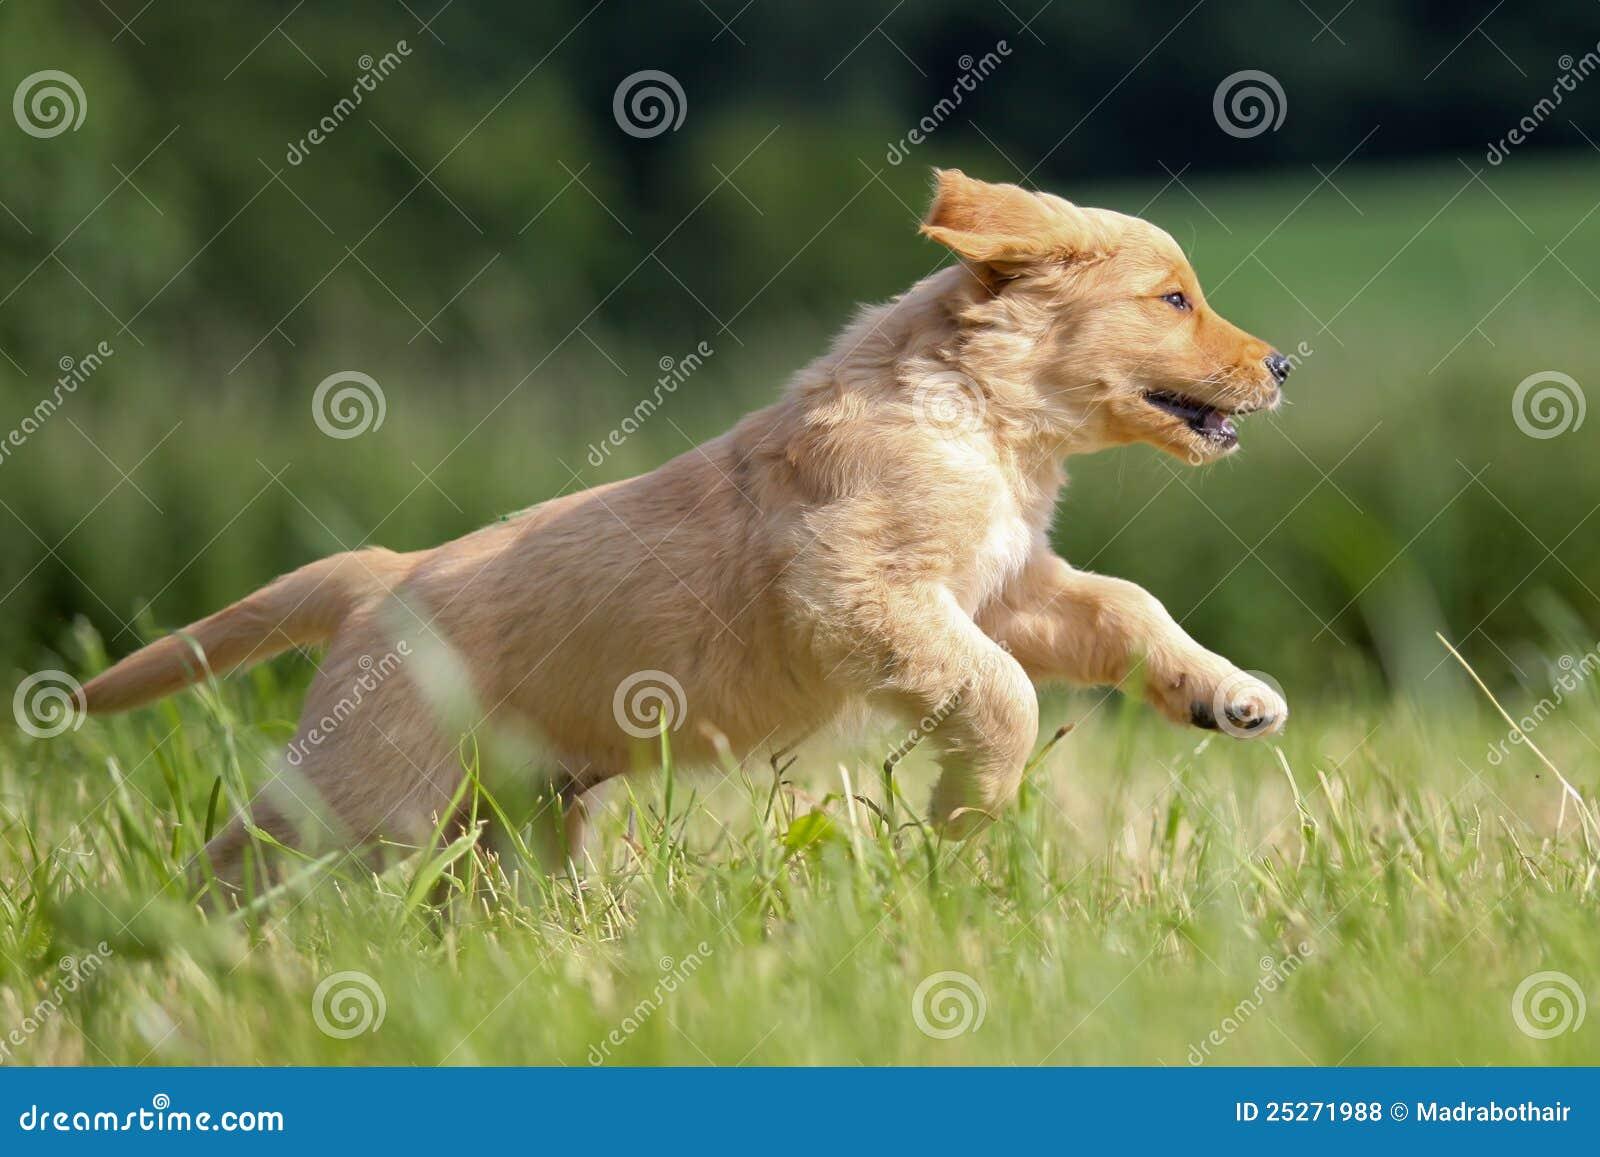 Running Golden Retriever Puppy Stock Photo Image Of Nature Pets